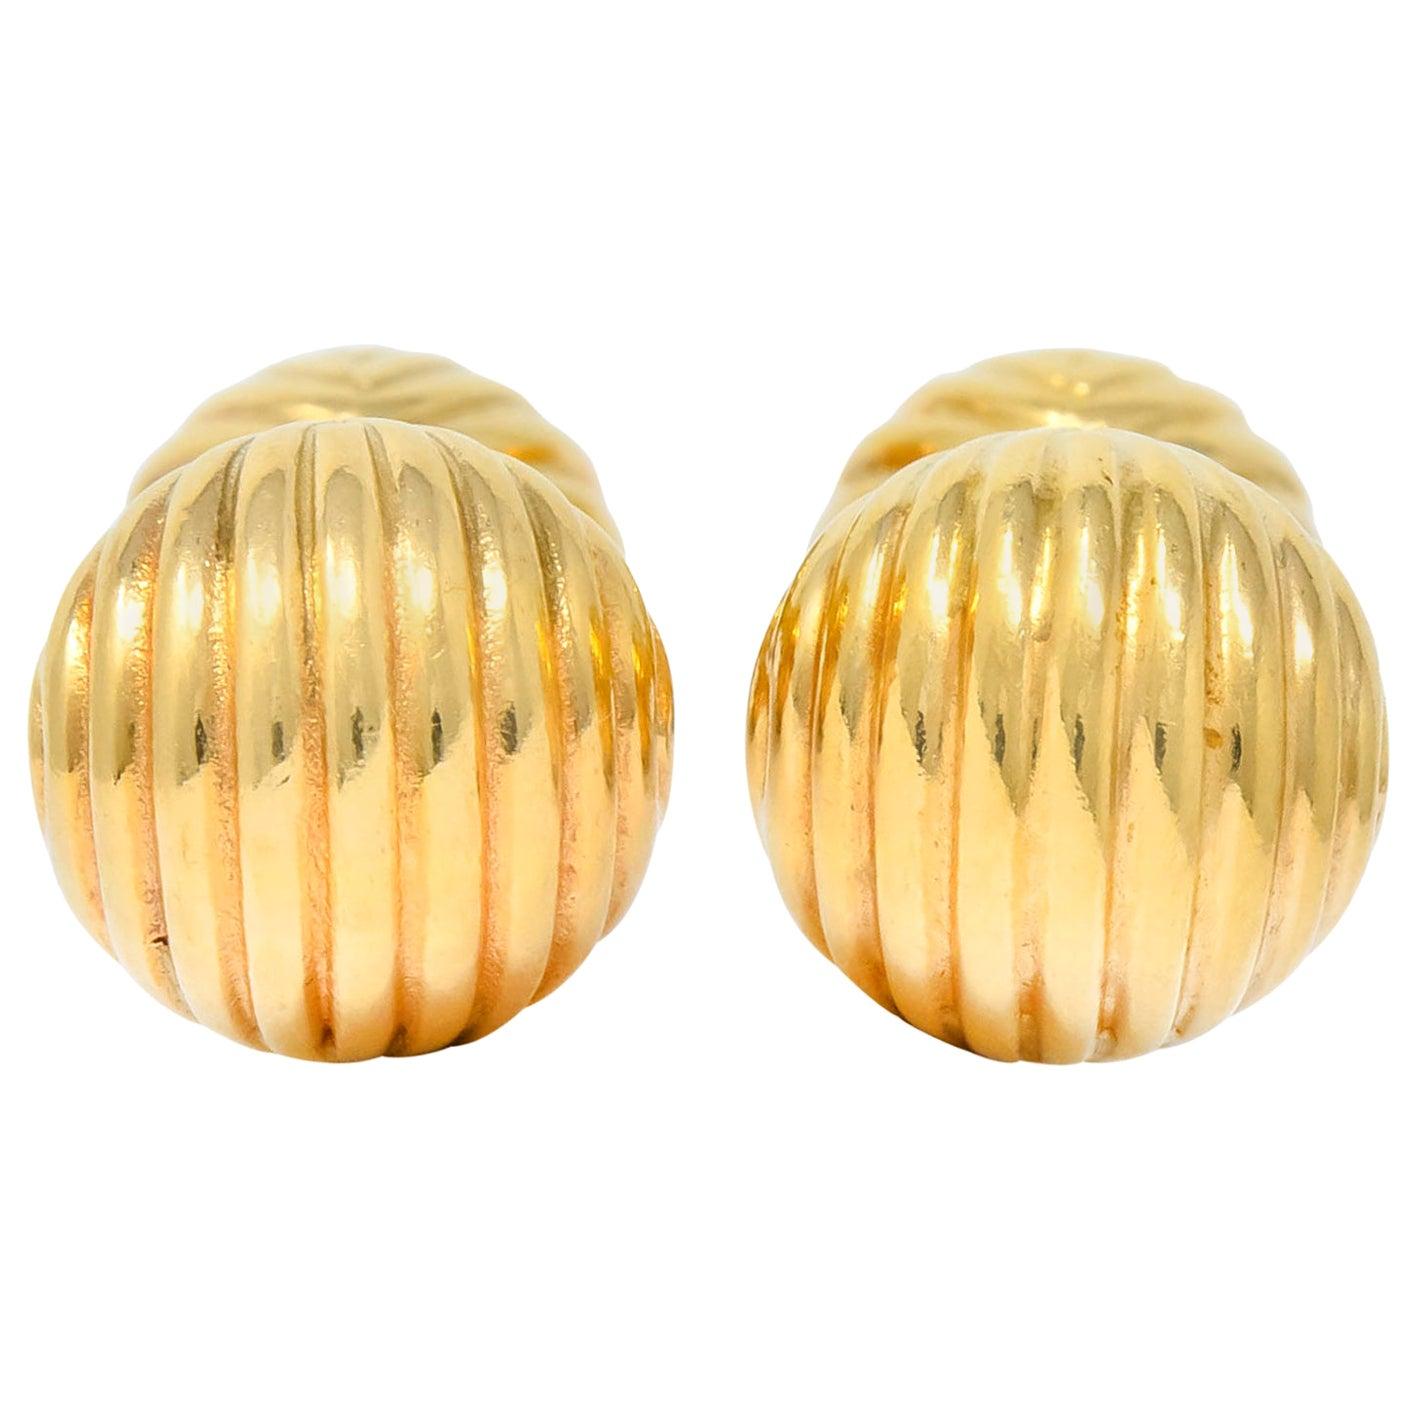 Tiffany & Co. 1960s Vintage 14 Karat Gold Ridged Ball Men's Cufflinks